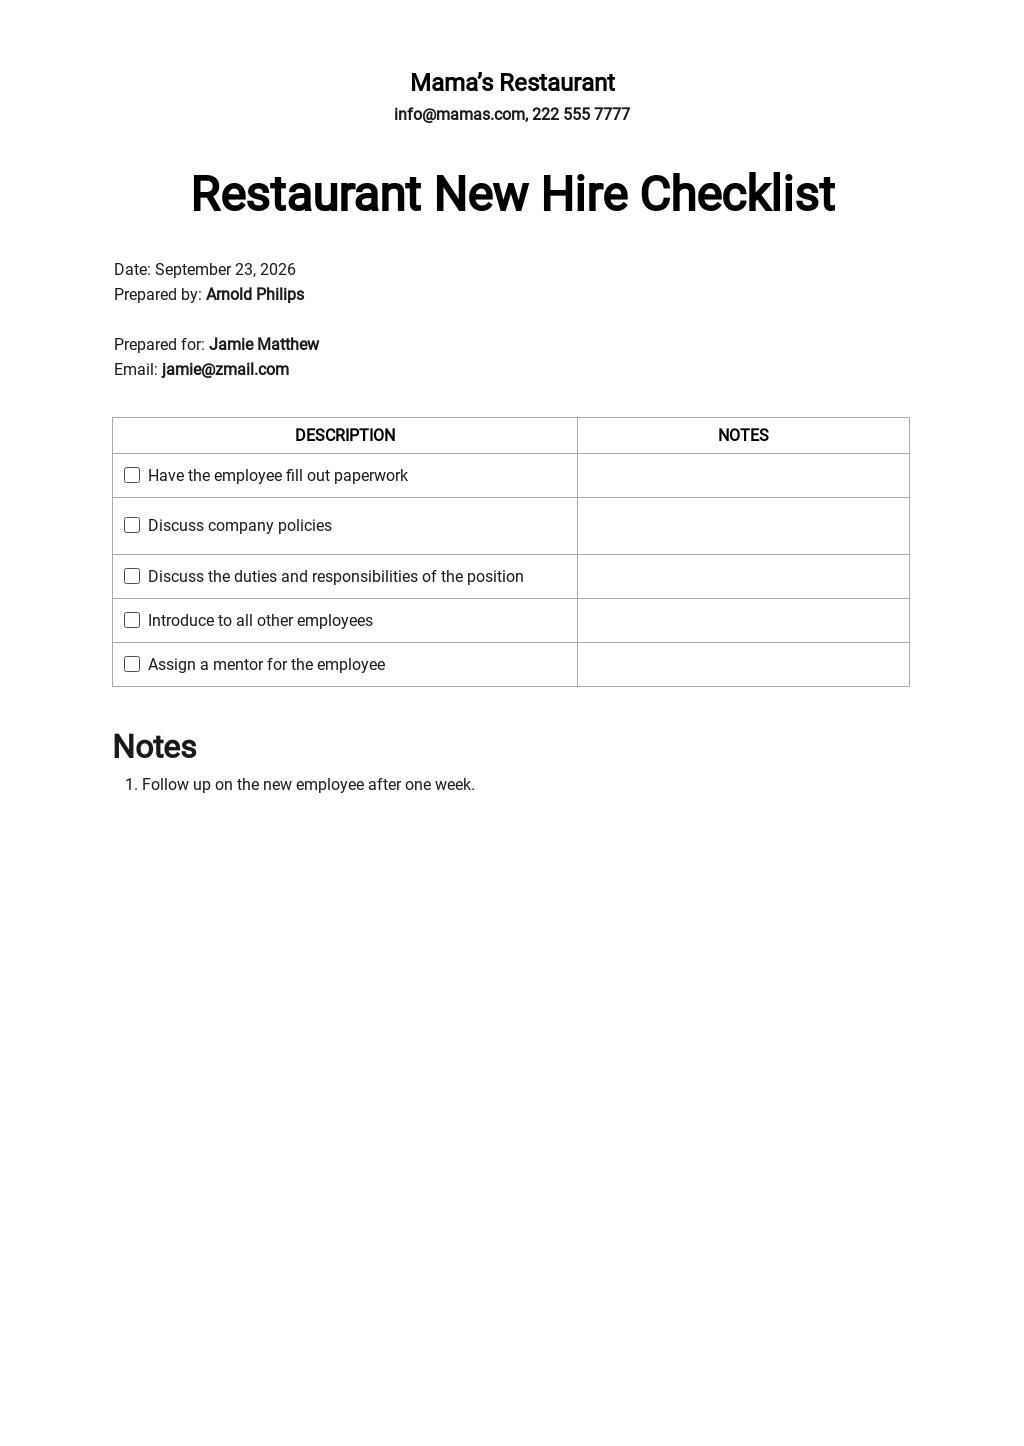 Restaurant New Hire Checklist Template.jpe